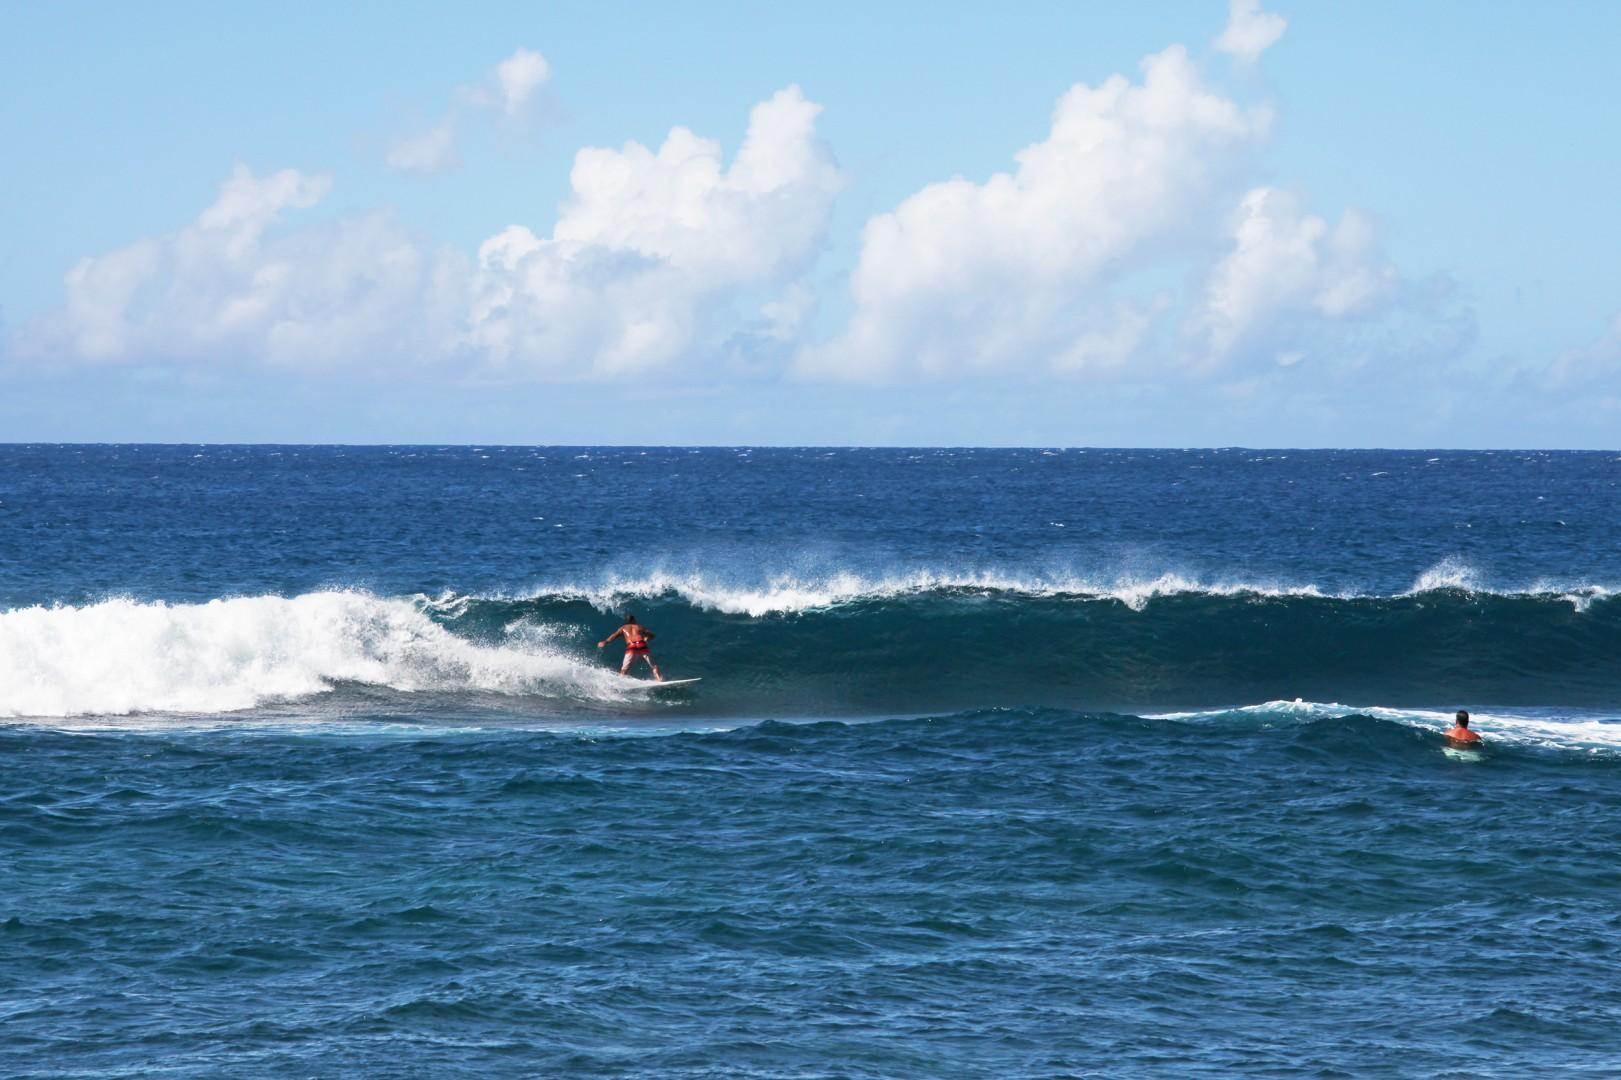 World class surfing nearby